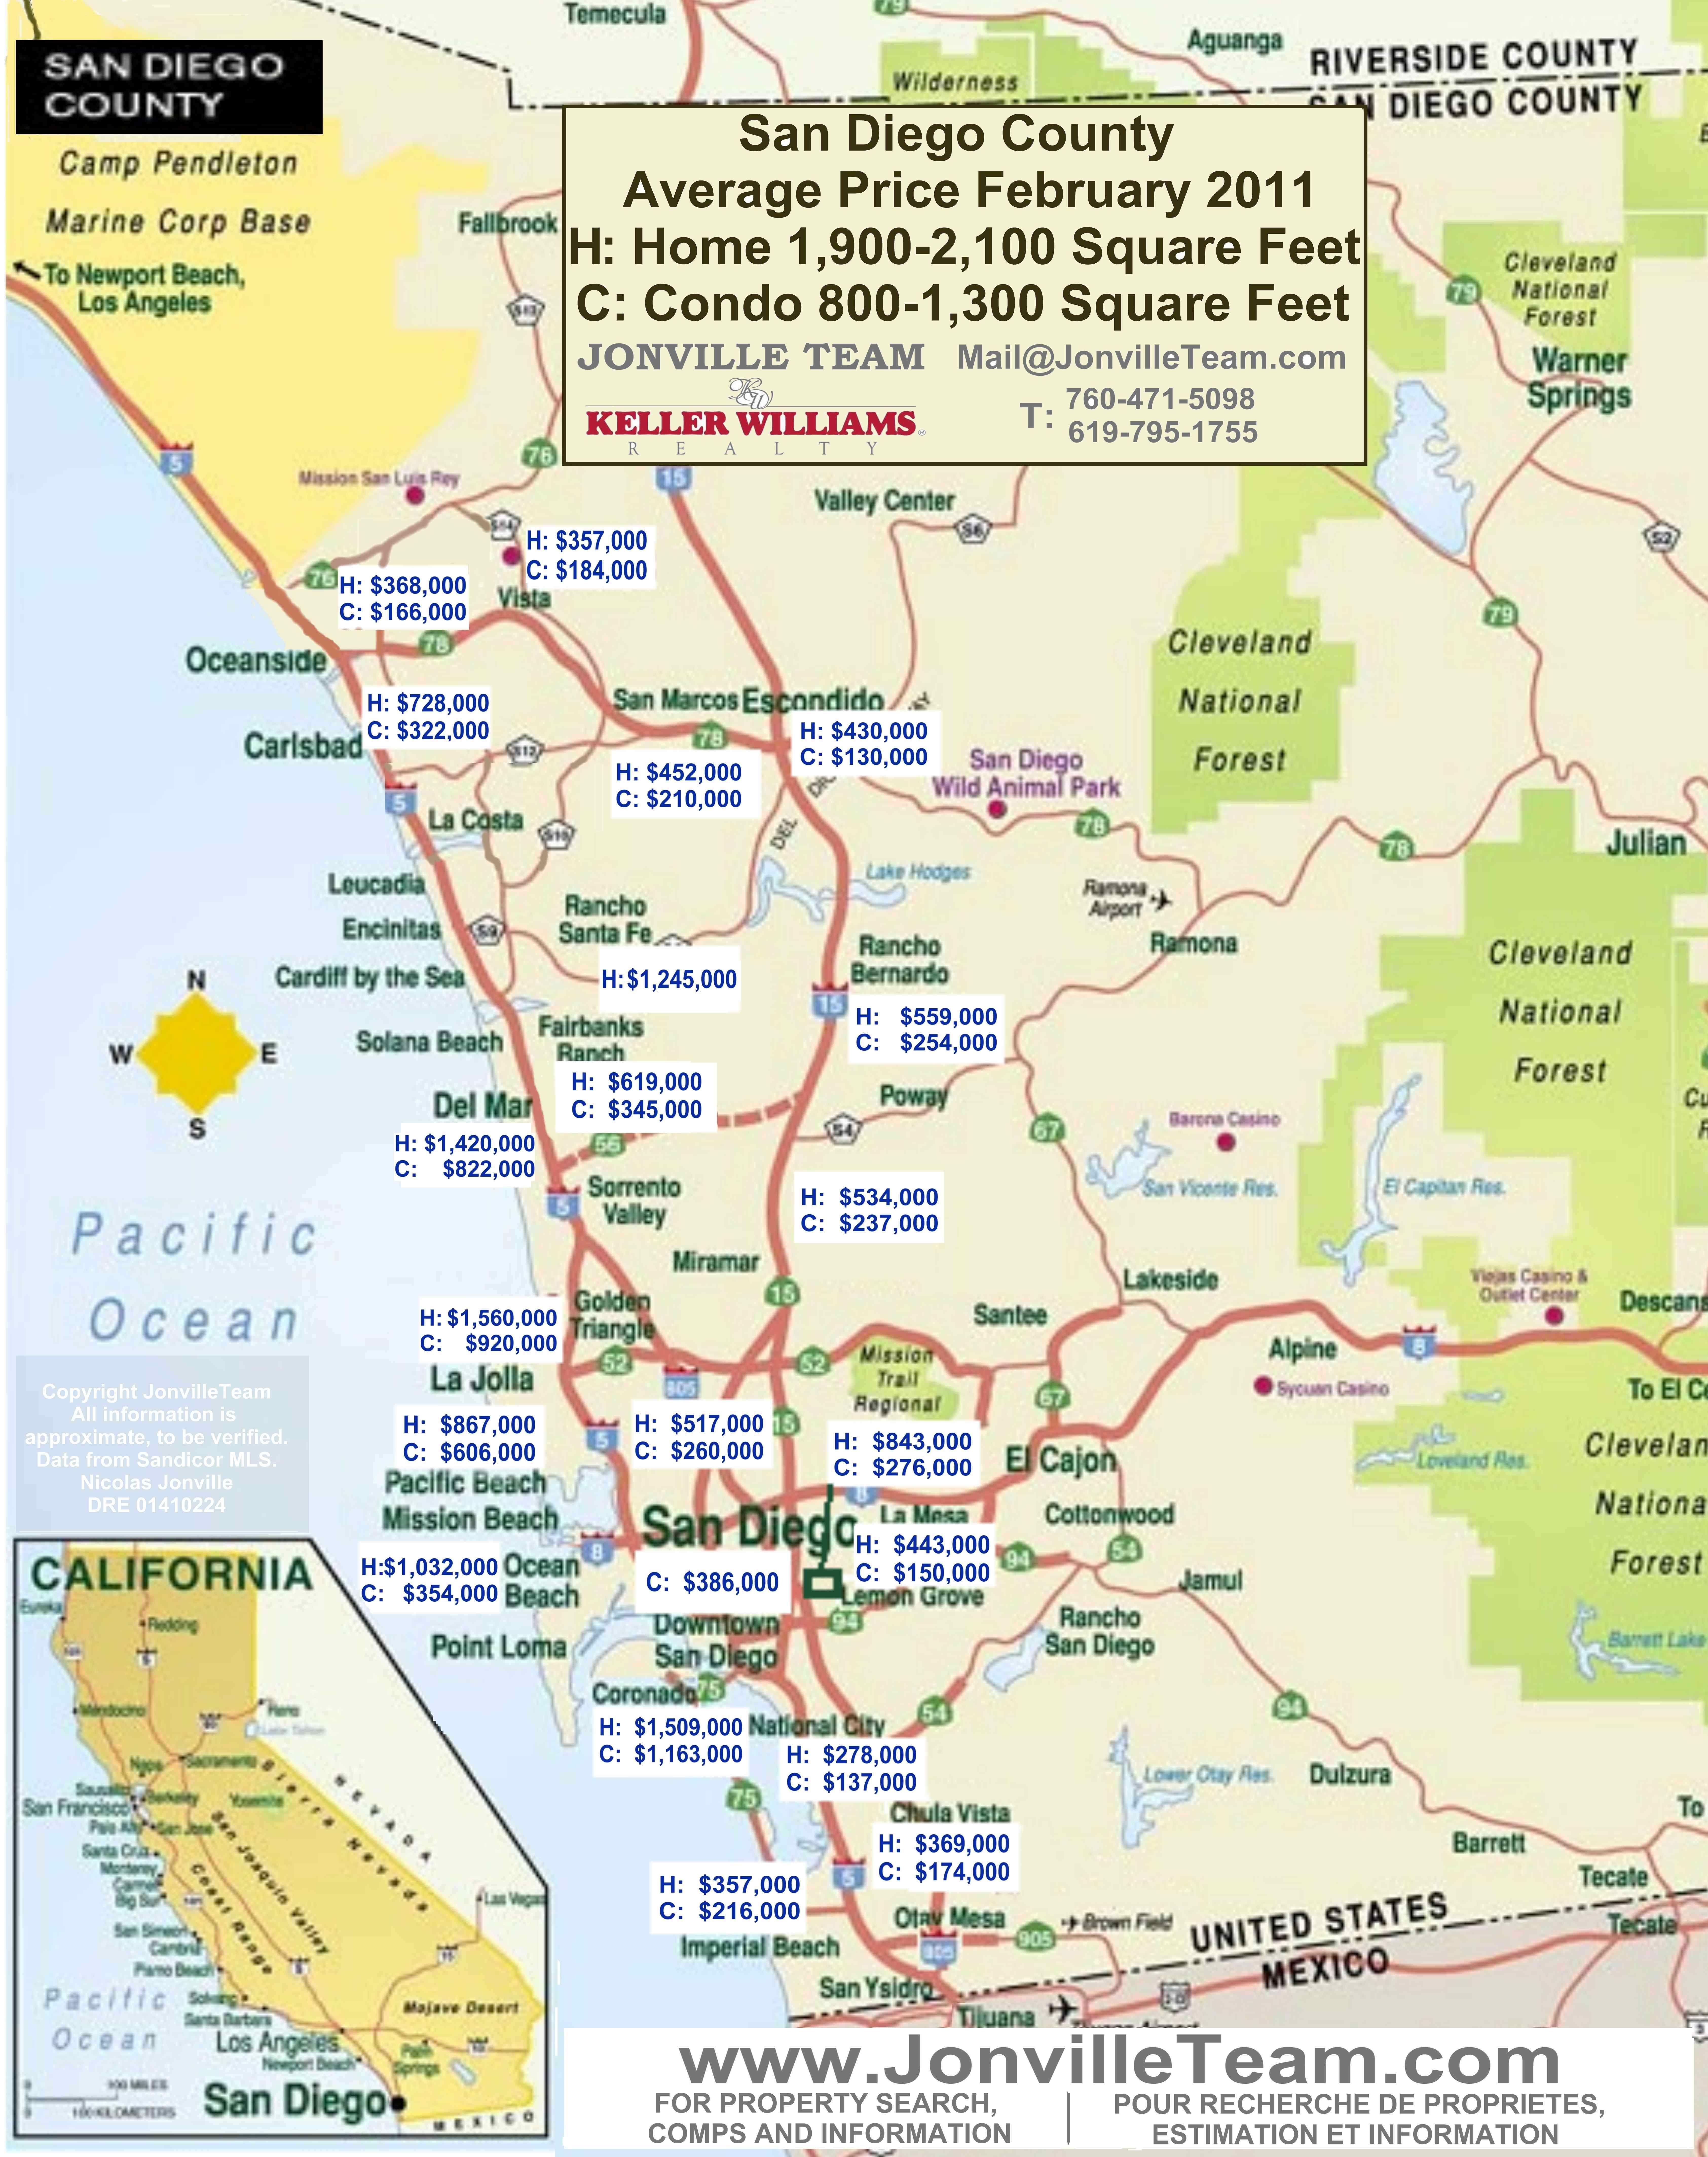 Pin By Krissy Staley On San Diego San Diego San Diego Map